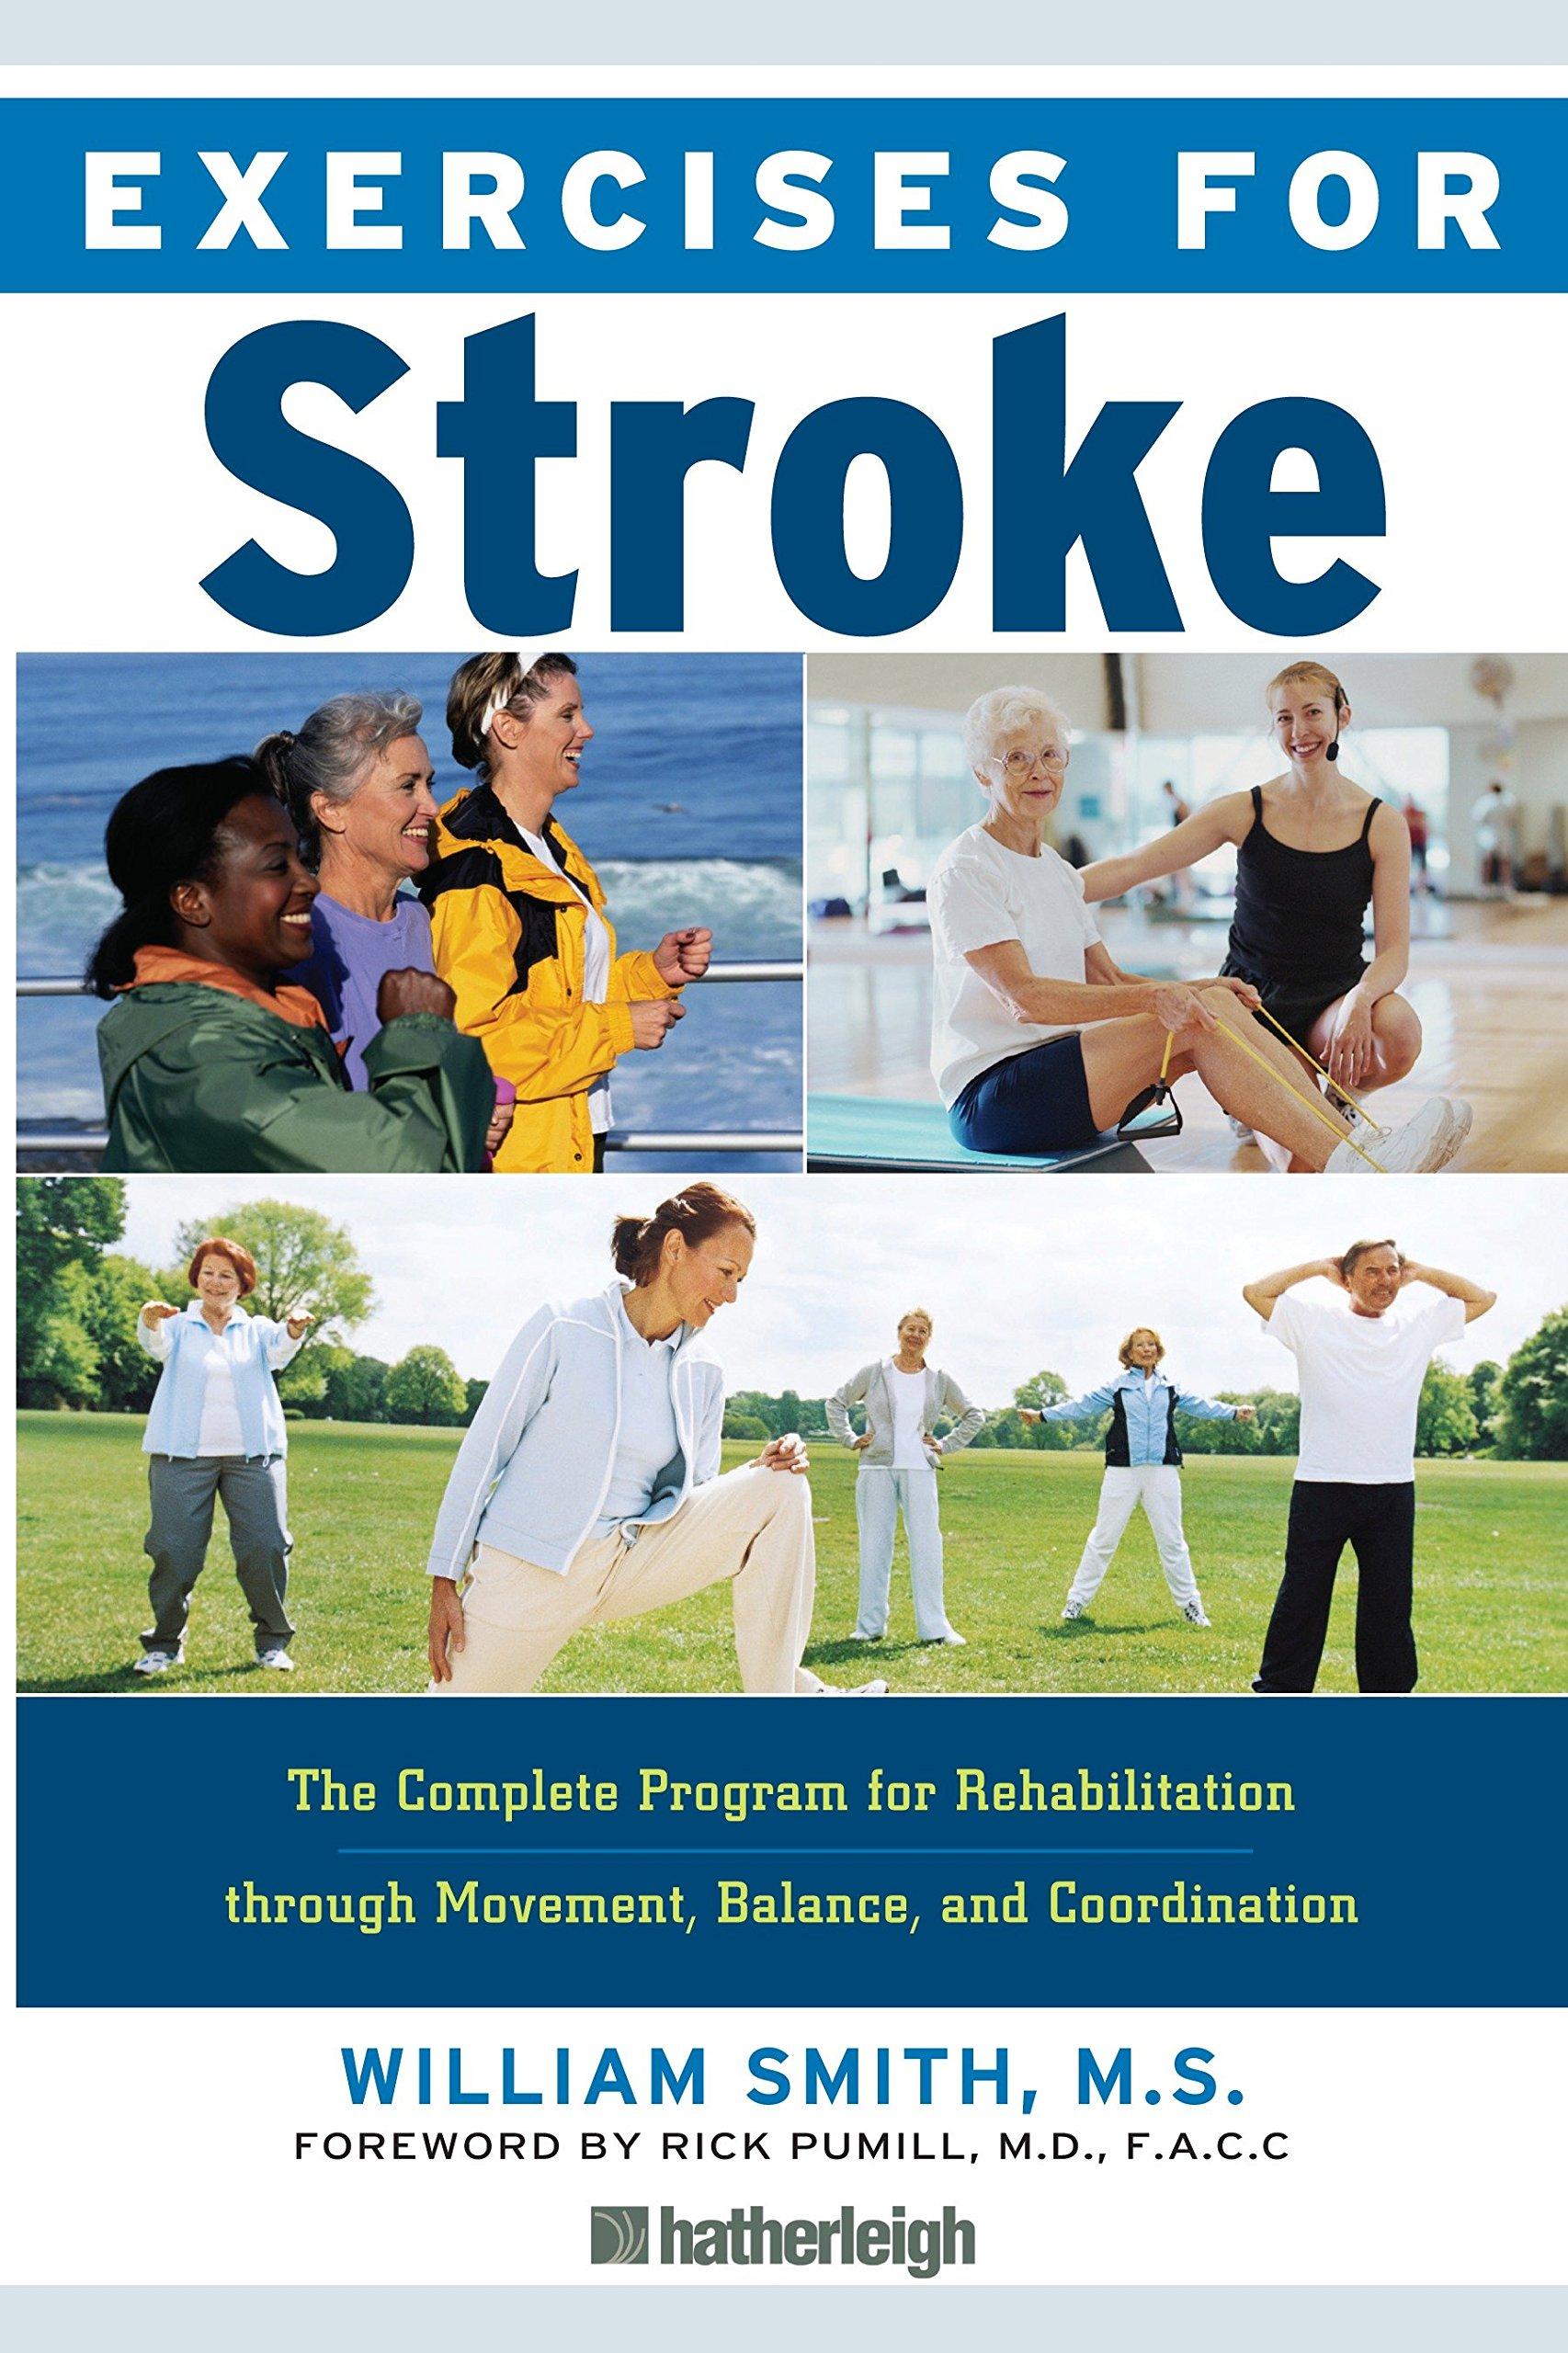 Exercises for Stroke: The Complete Program for